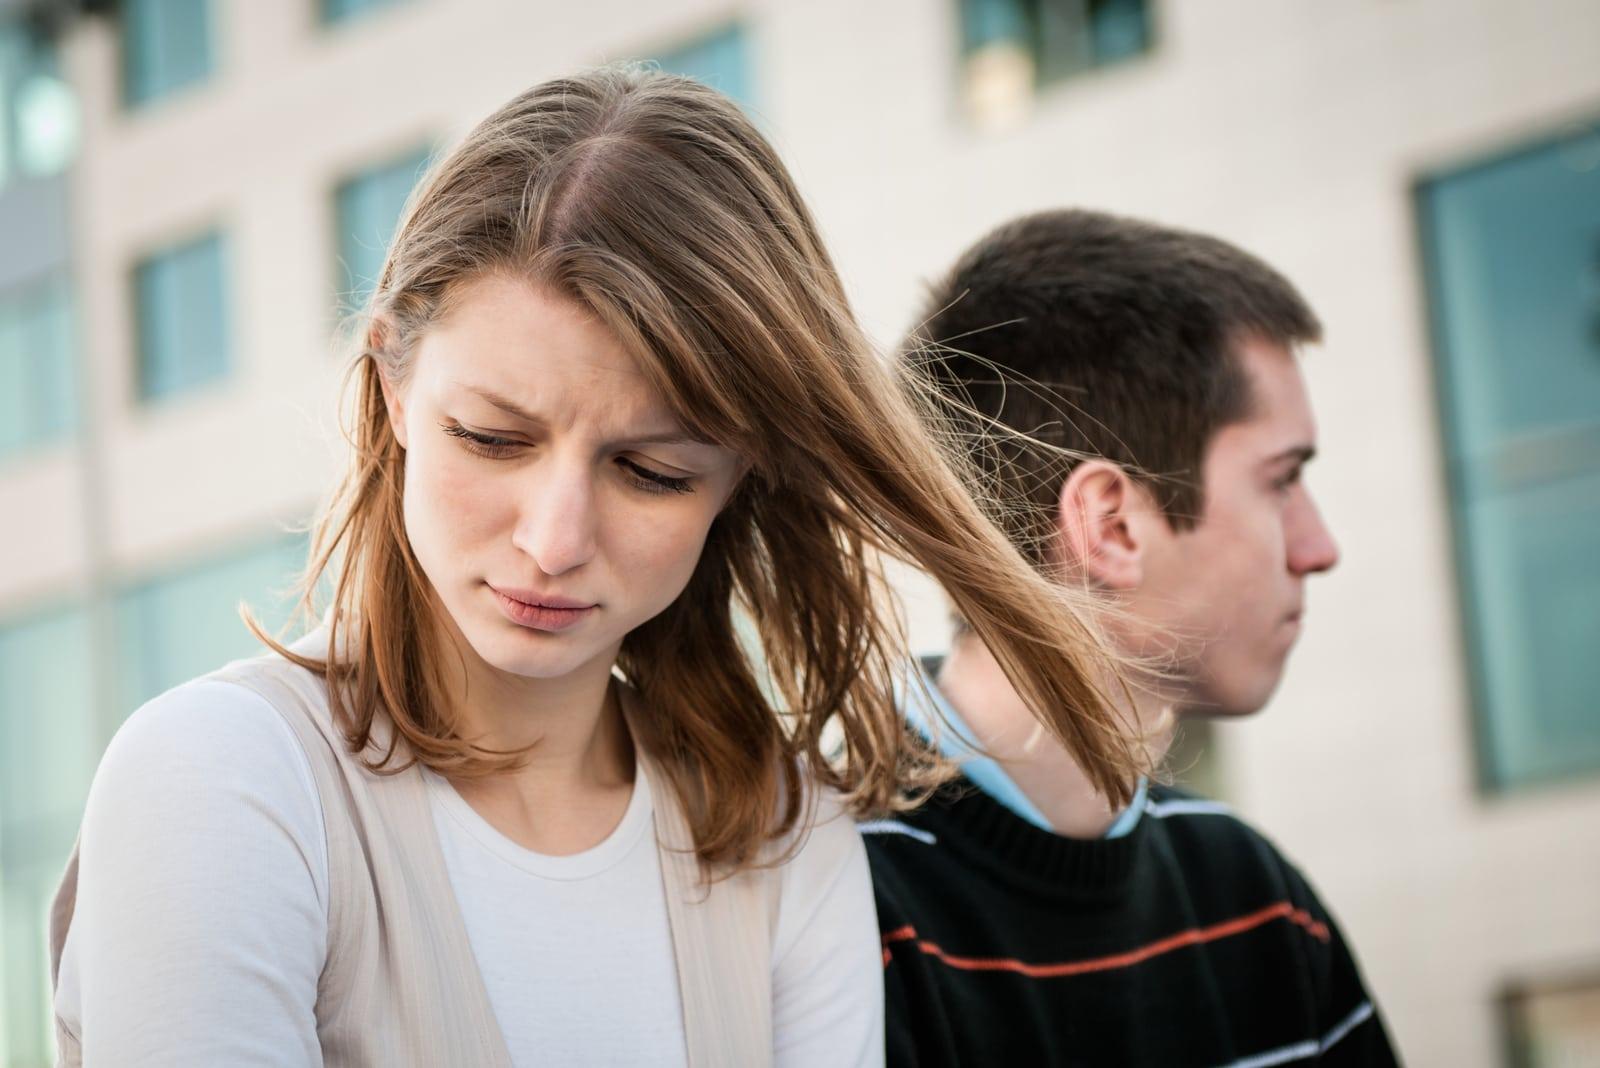 upset and sad young couple